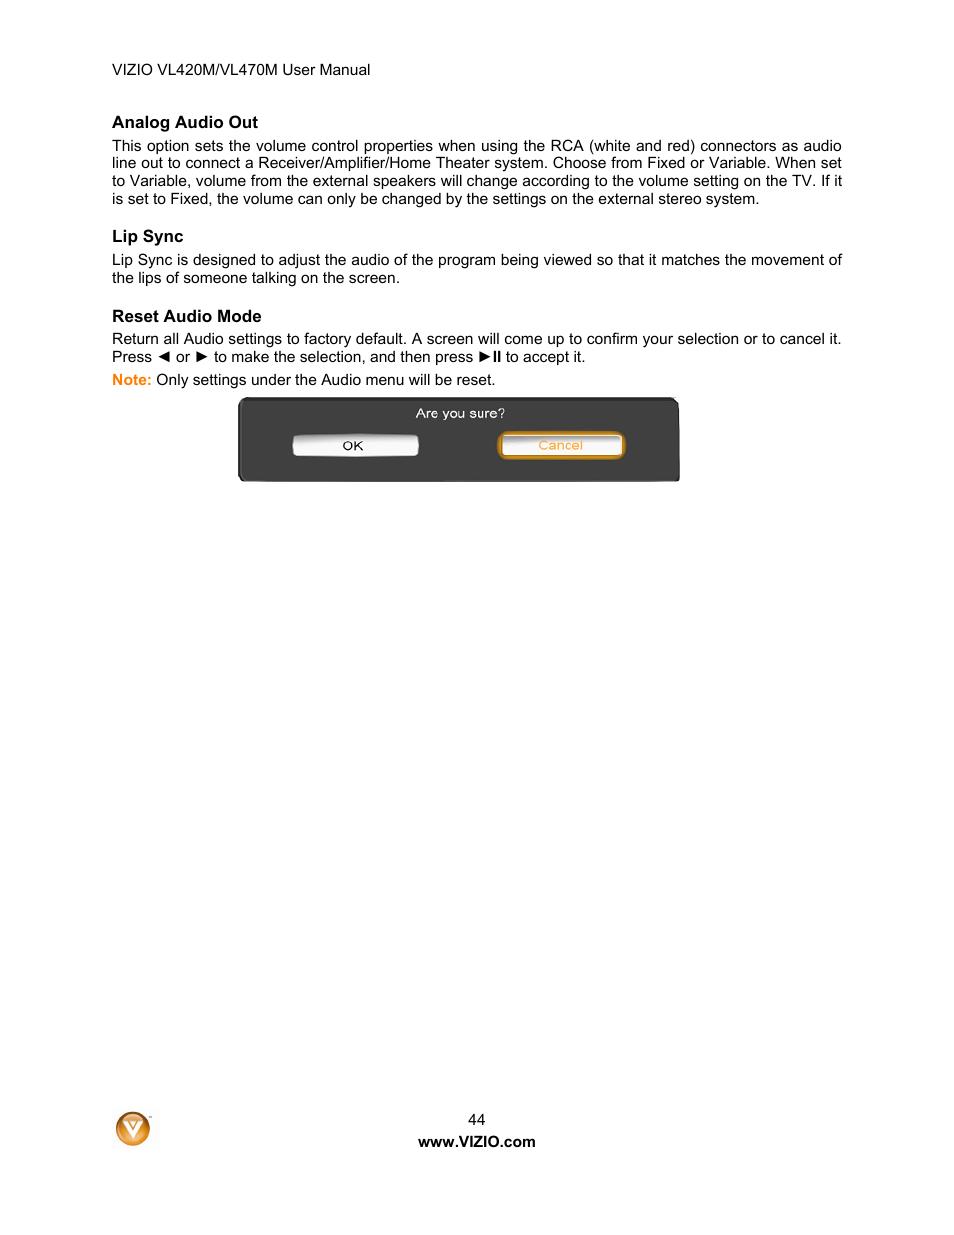 Vizio VL470M User Manual   Page 44 / 64